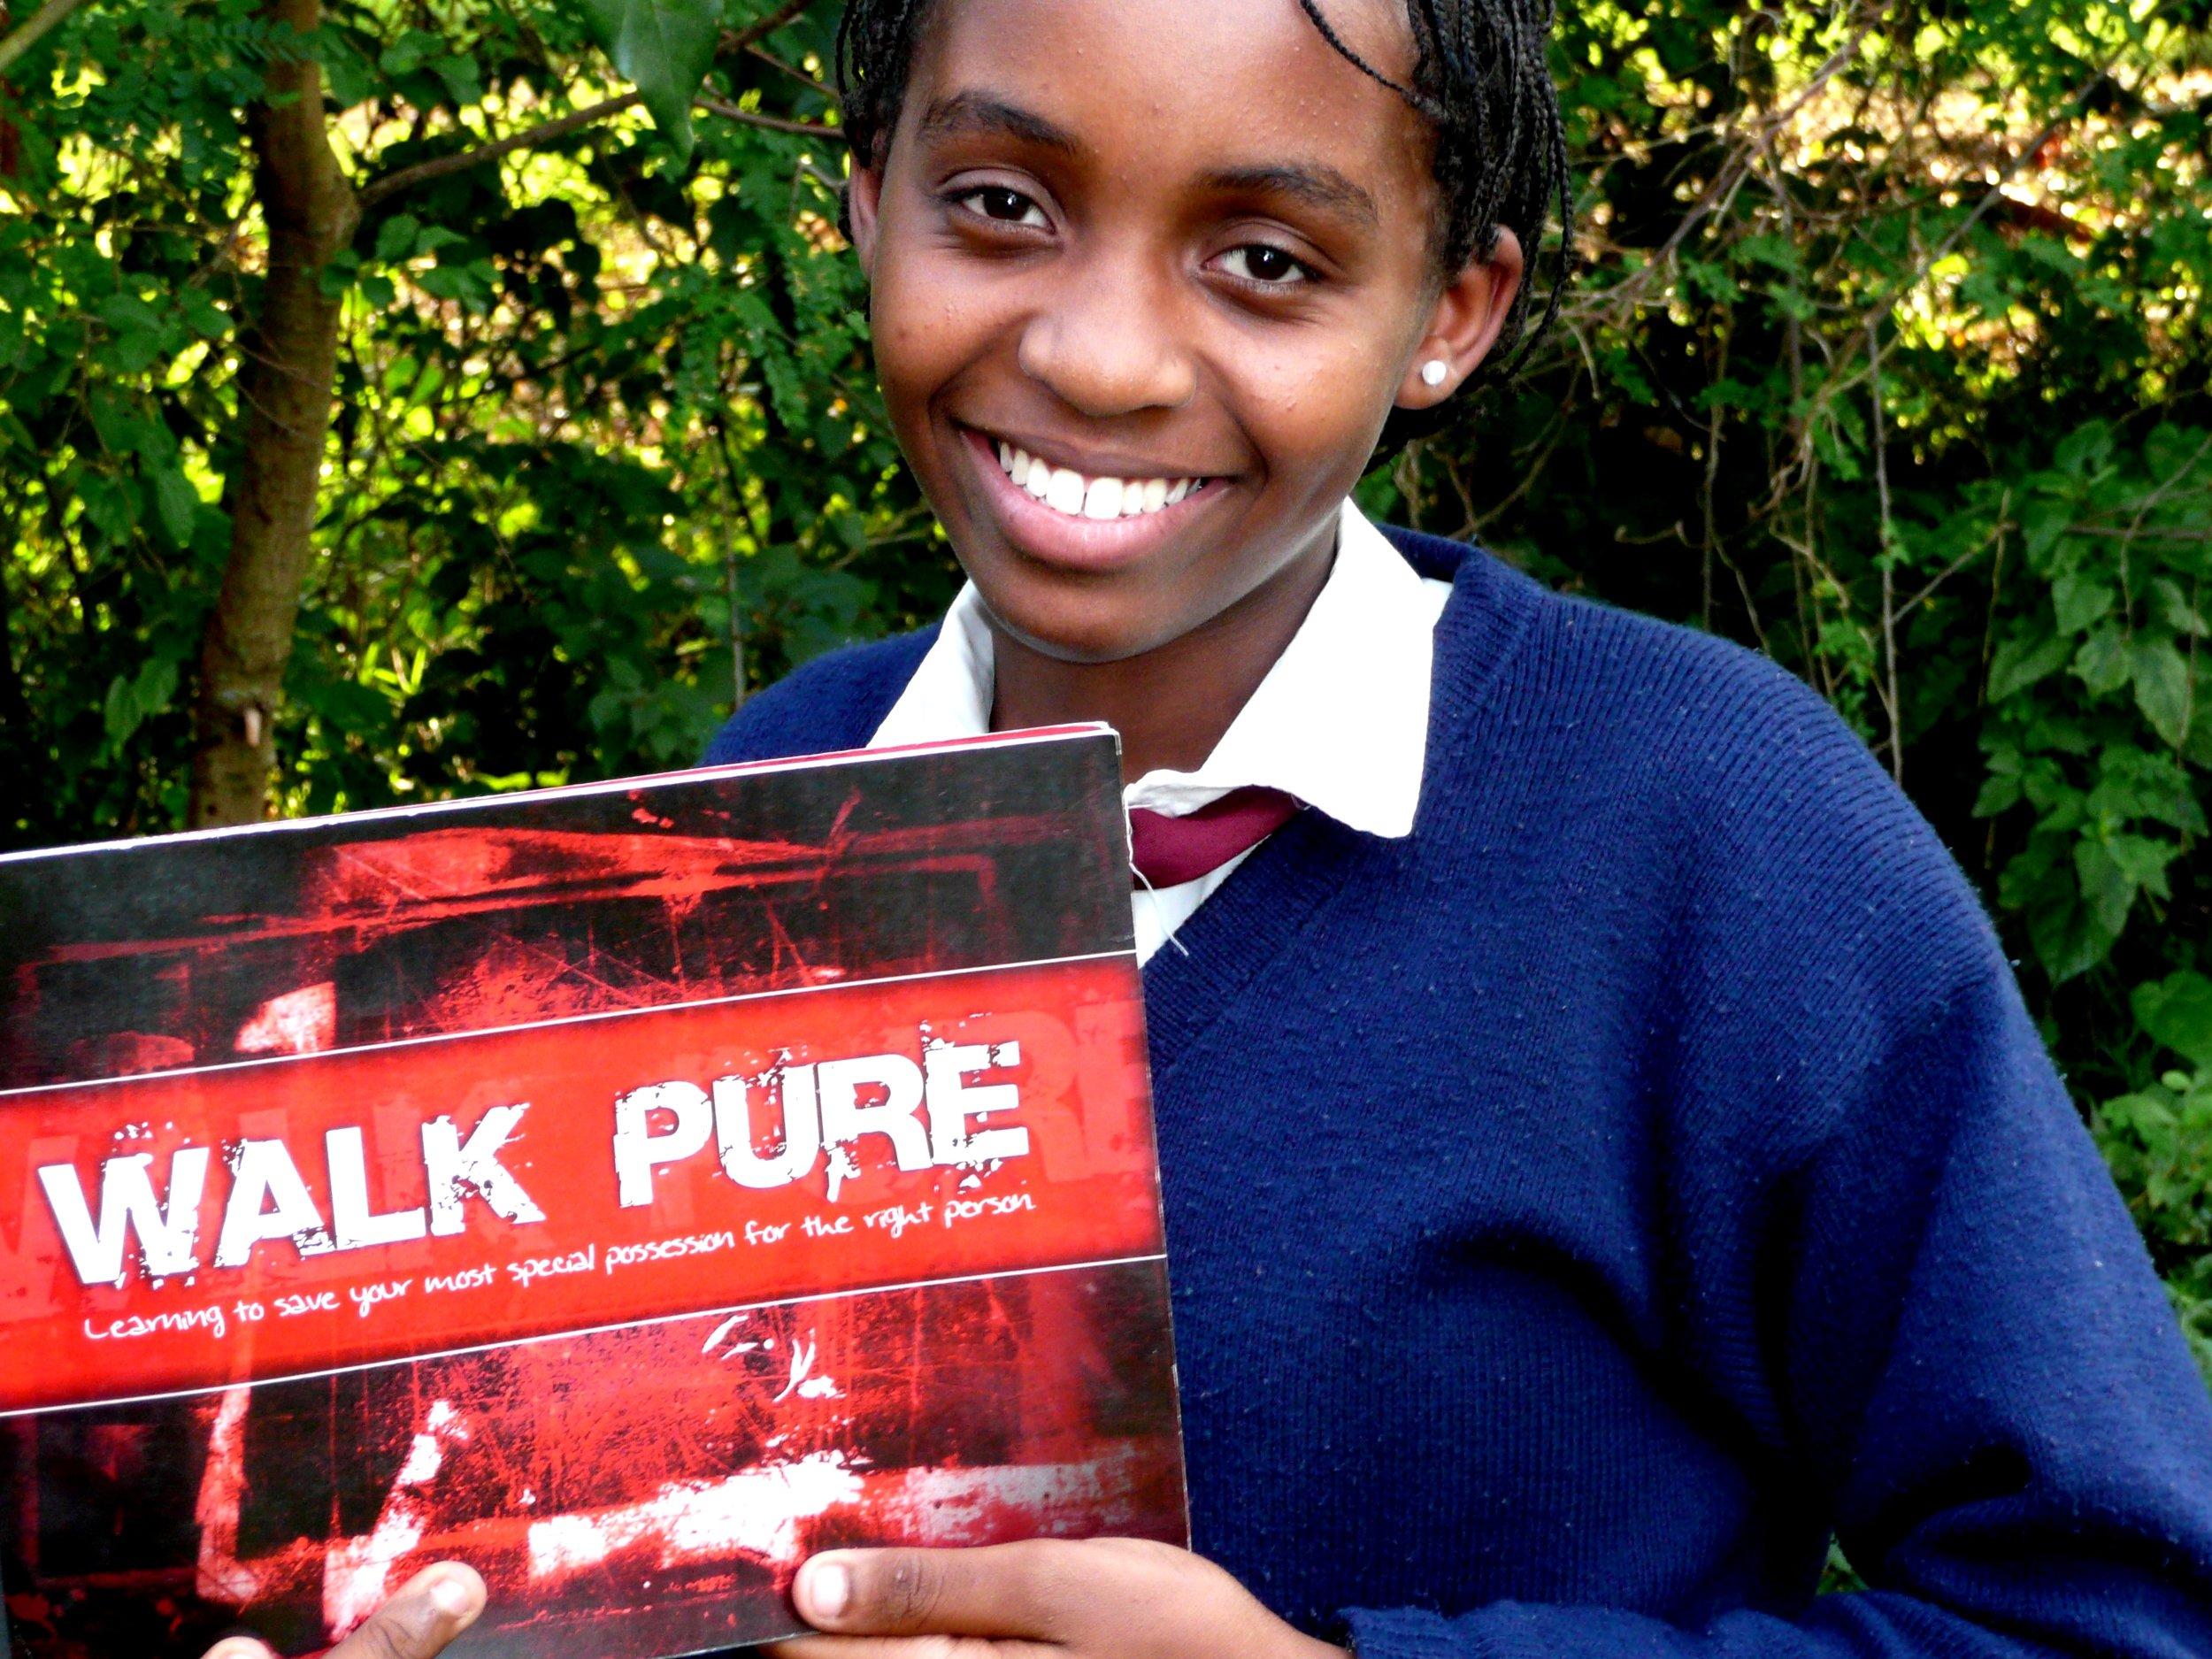 Girl with Walk Pure book.JPG